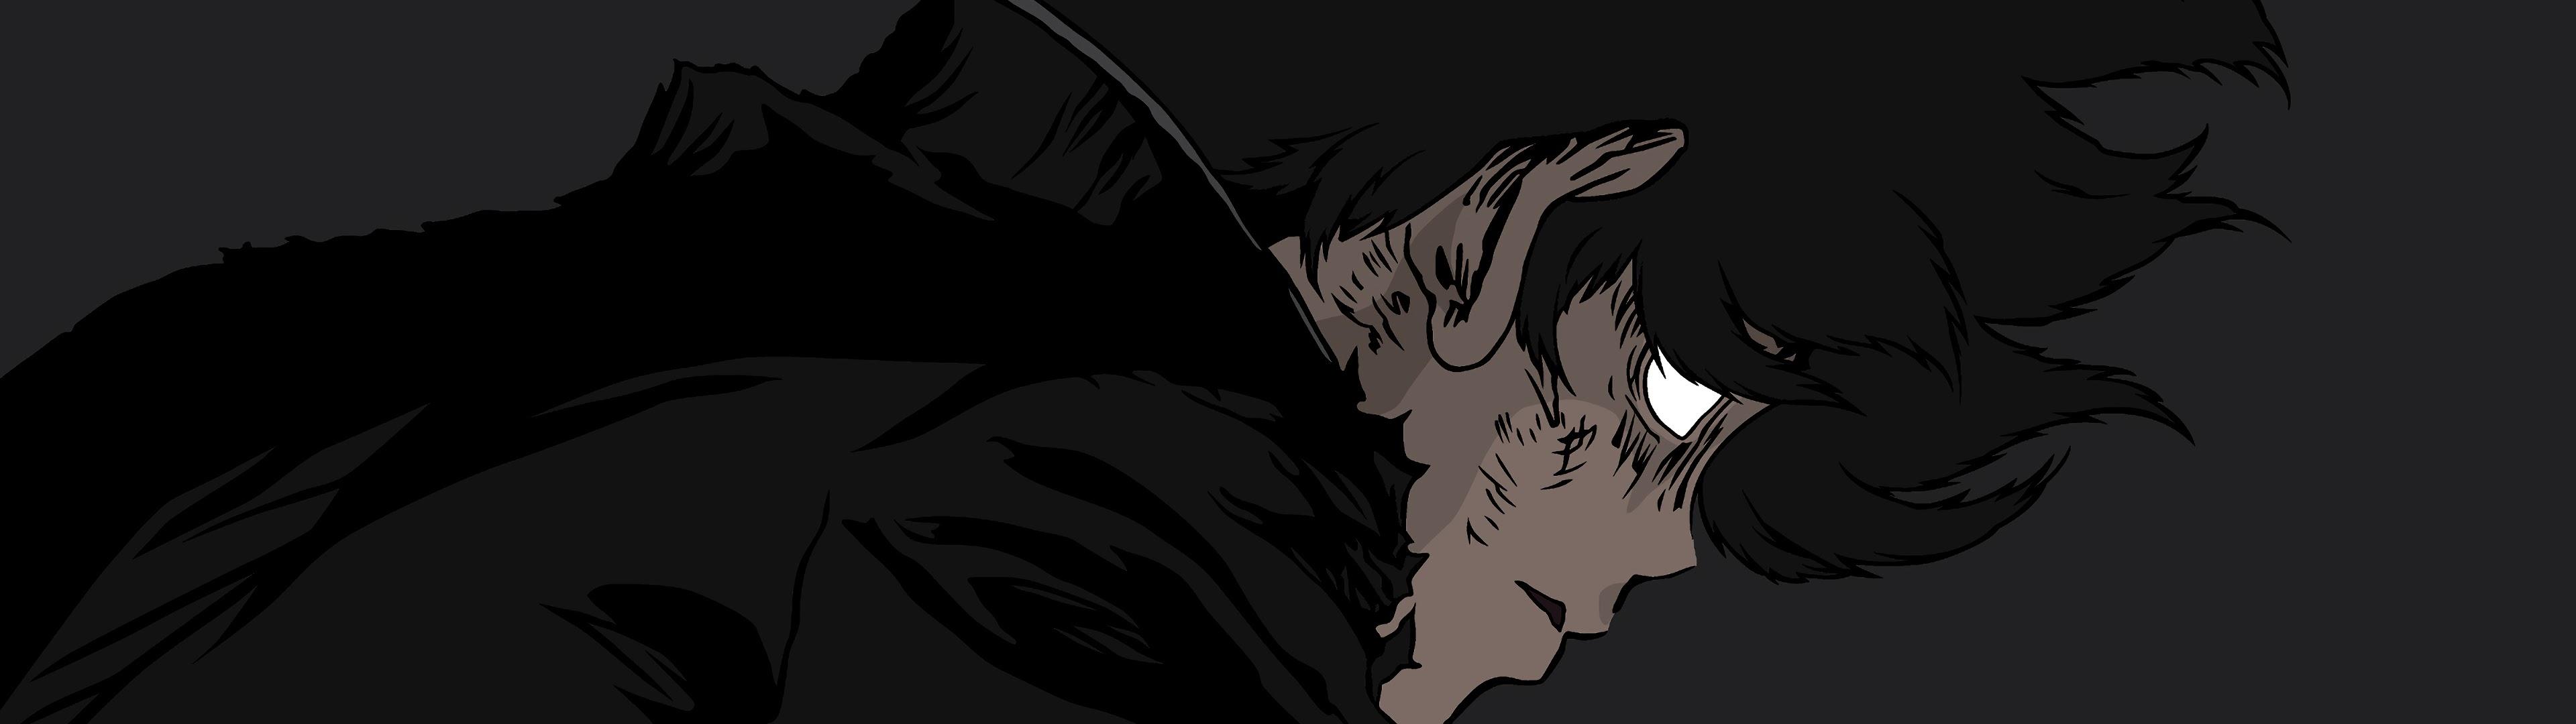 Shigeo Kageyama Mob Psycho 100 100 Rage 4k 3840x2160 Wallpaper 8